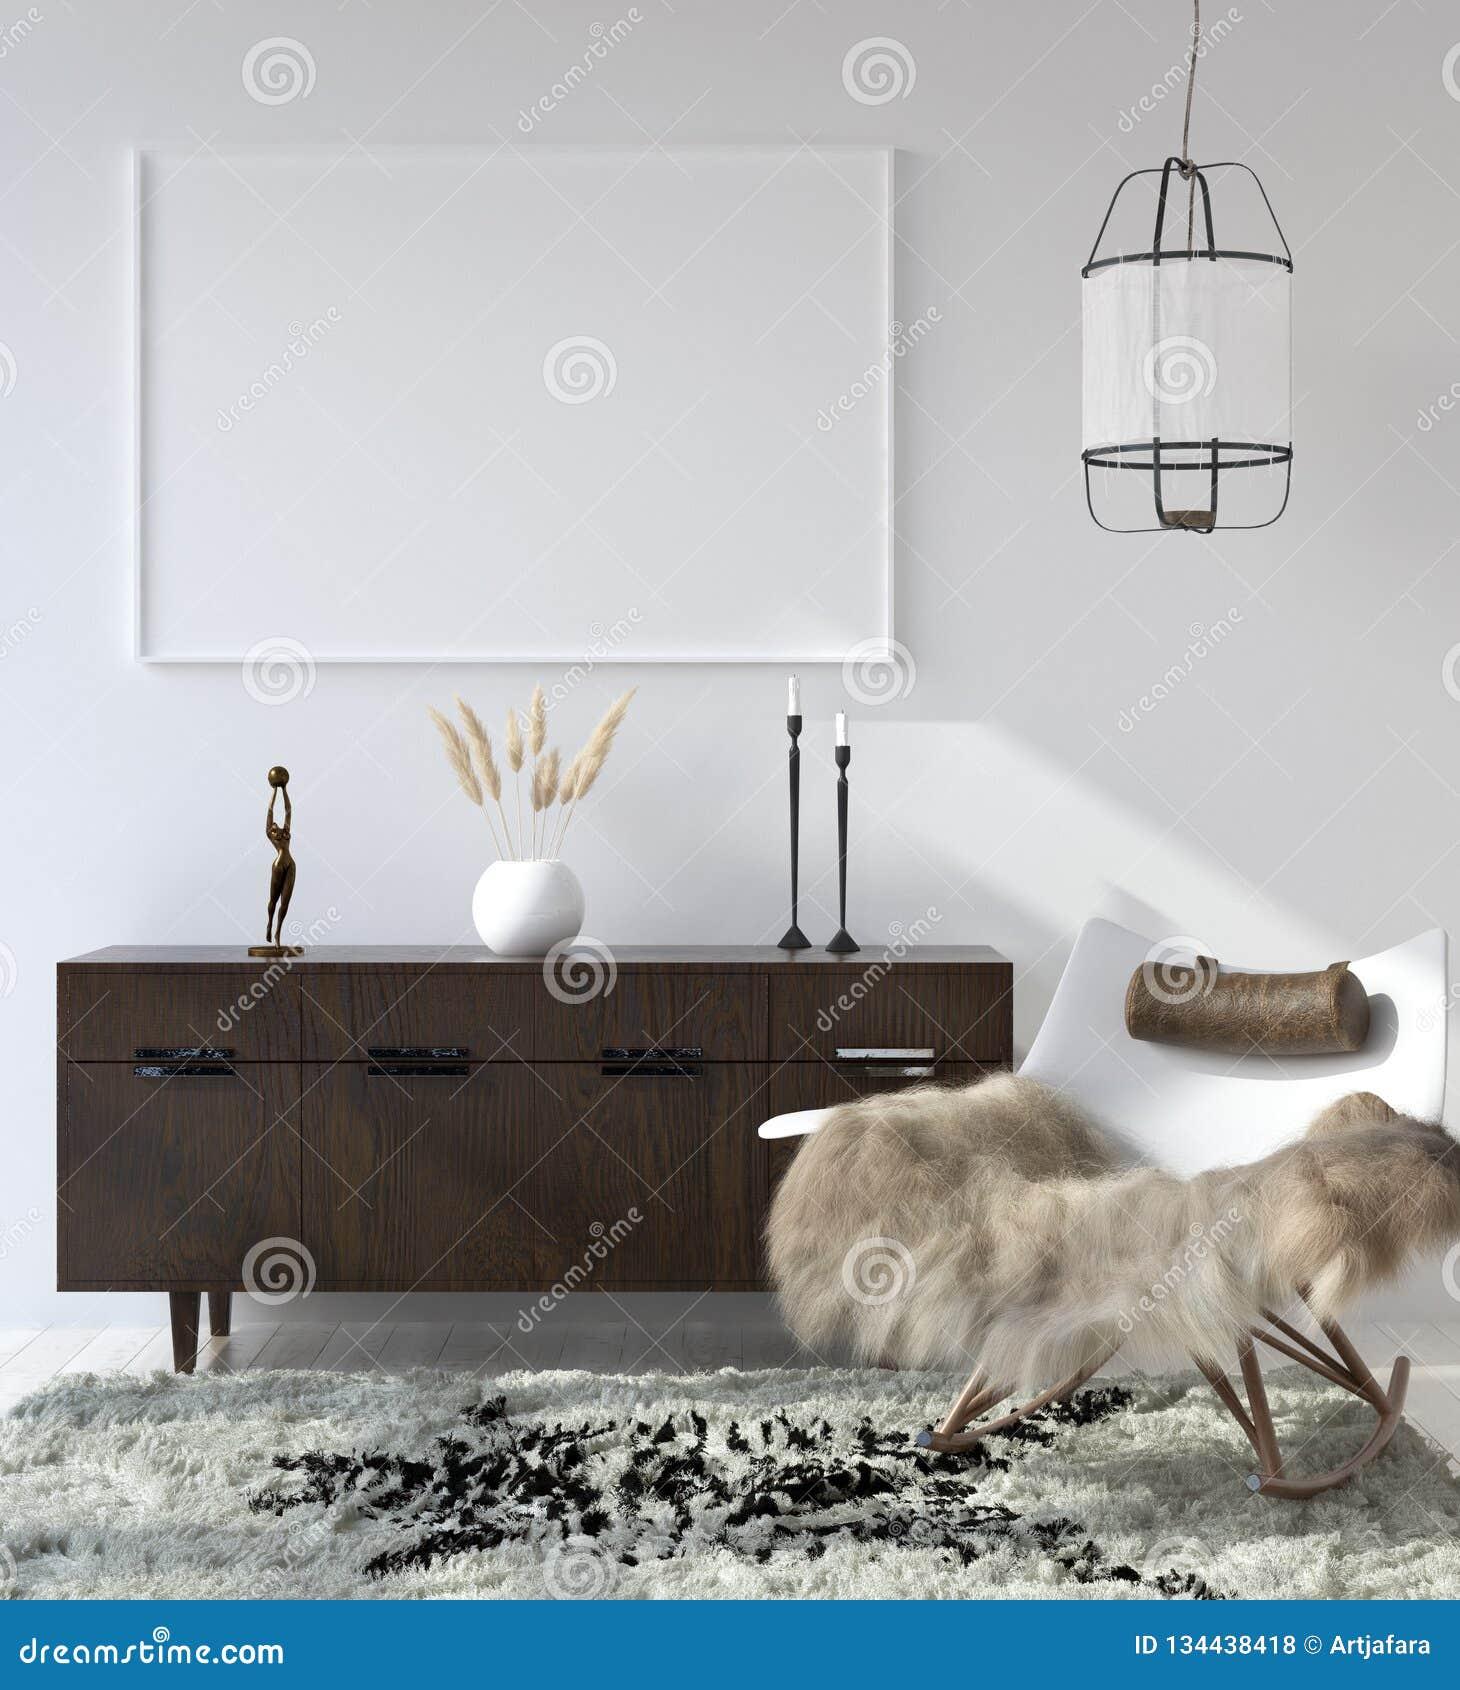 Falsk övre affischram i hemmiljöbakgrund, bohemisk stilvardagsrum